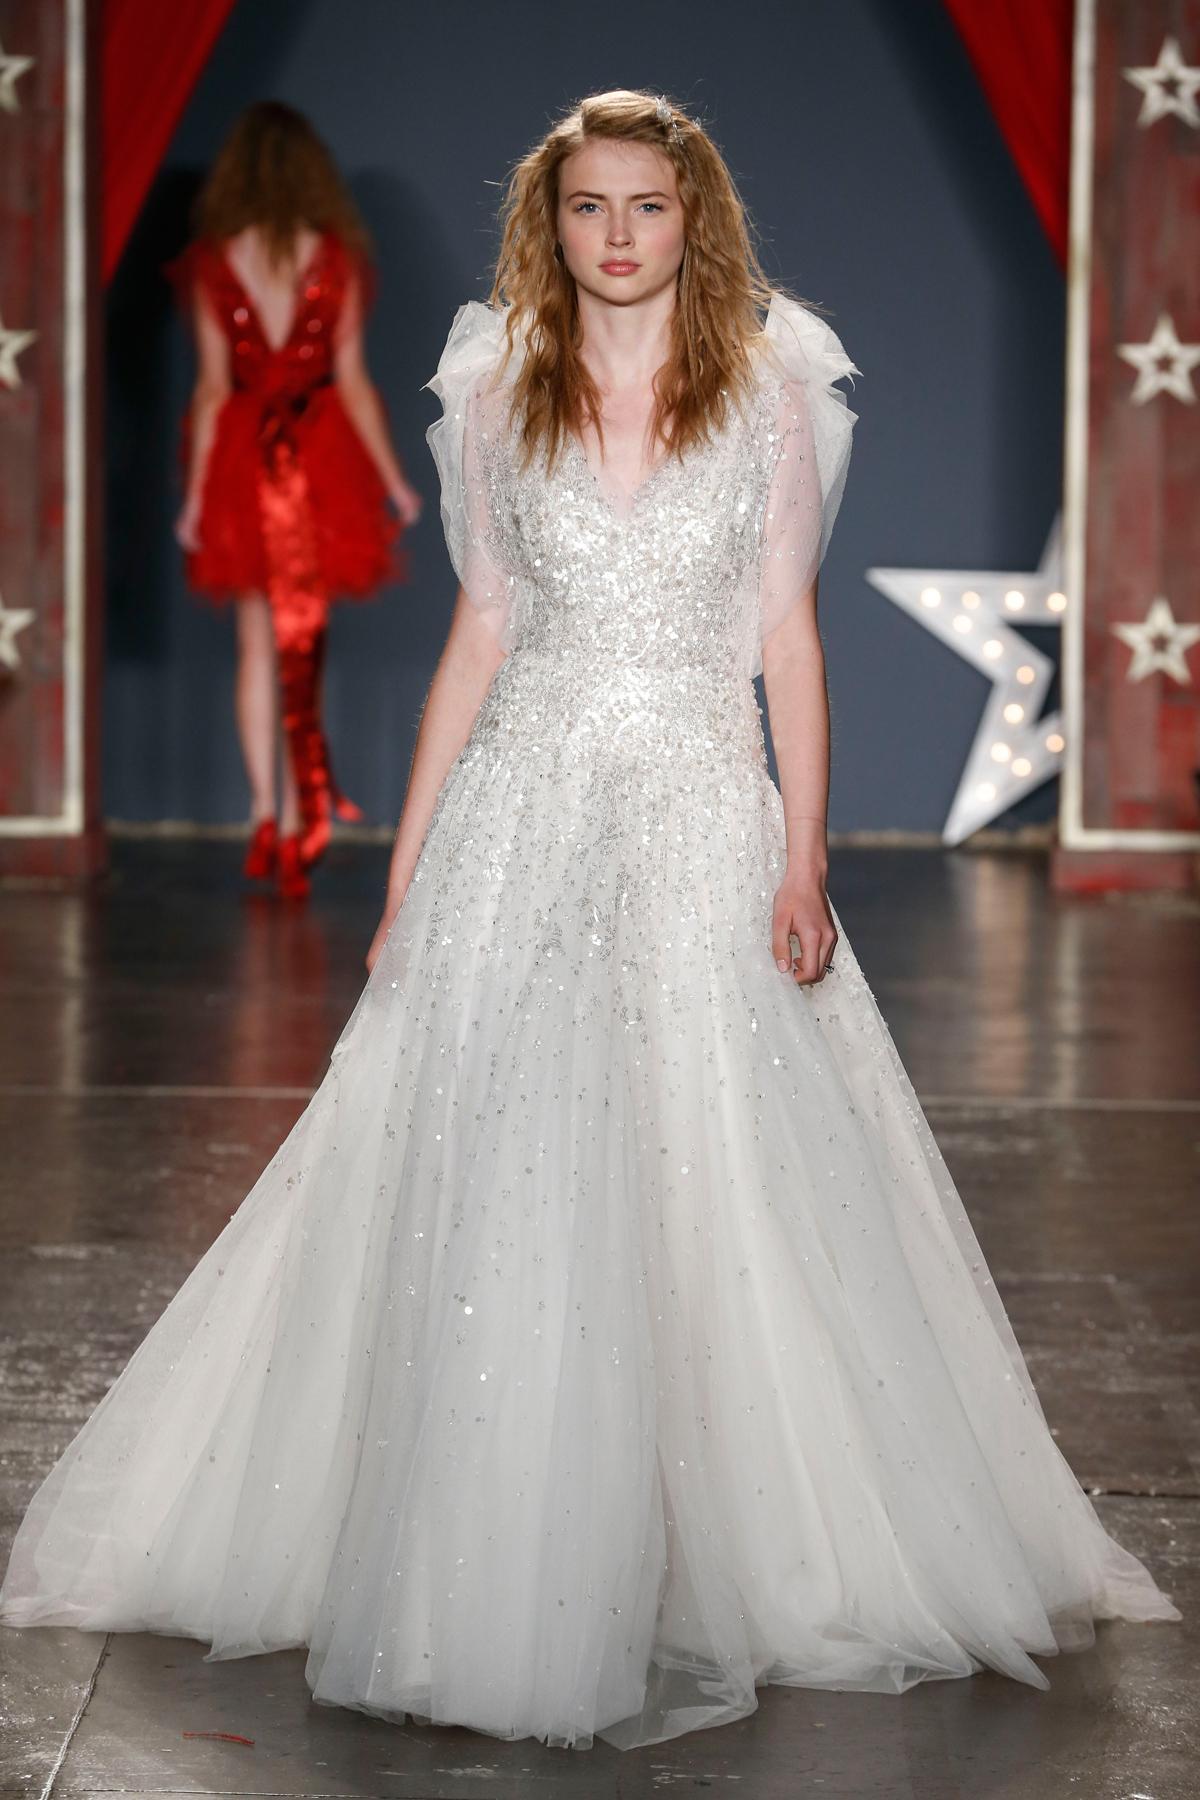 Bridal Dresses 2018 Uk - Wedding Dresses Asian